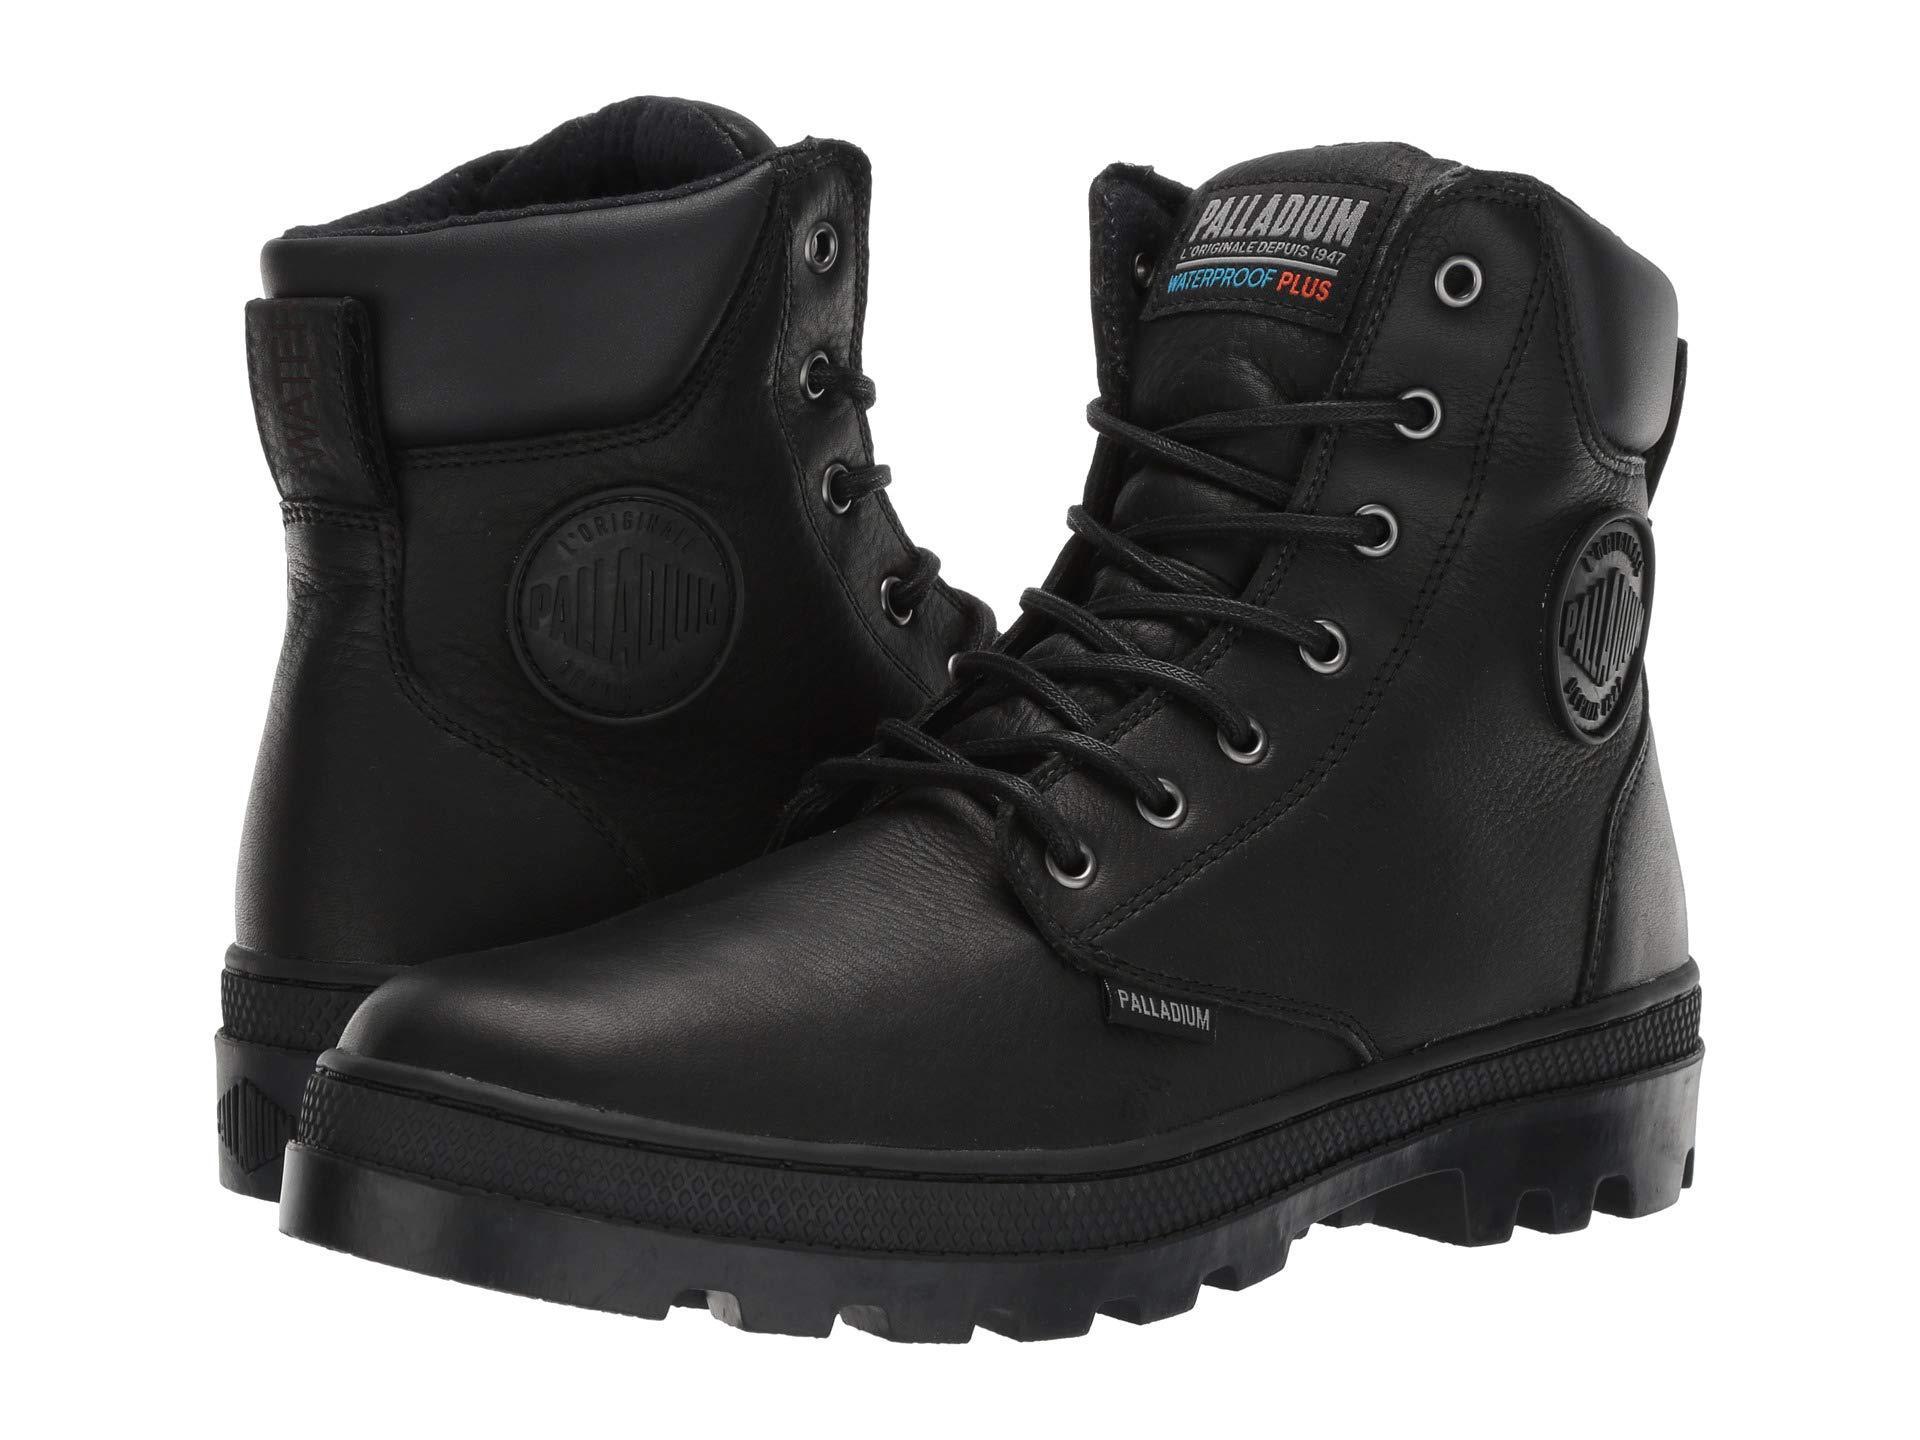 63c4db81c8 Palladium Pallabosse Sport Cuff Wp (black/black) Men's Lace-up Boots ...